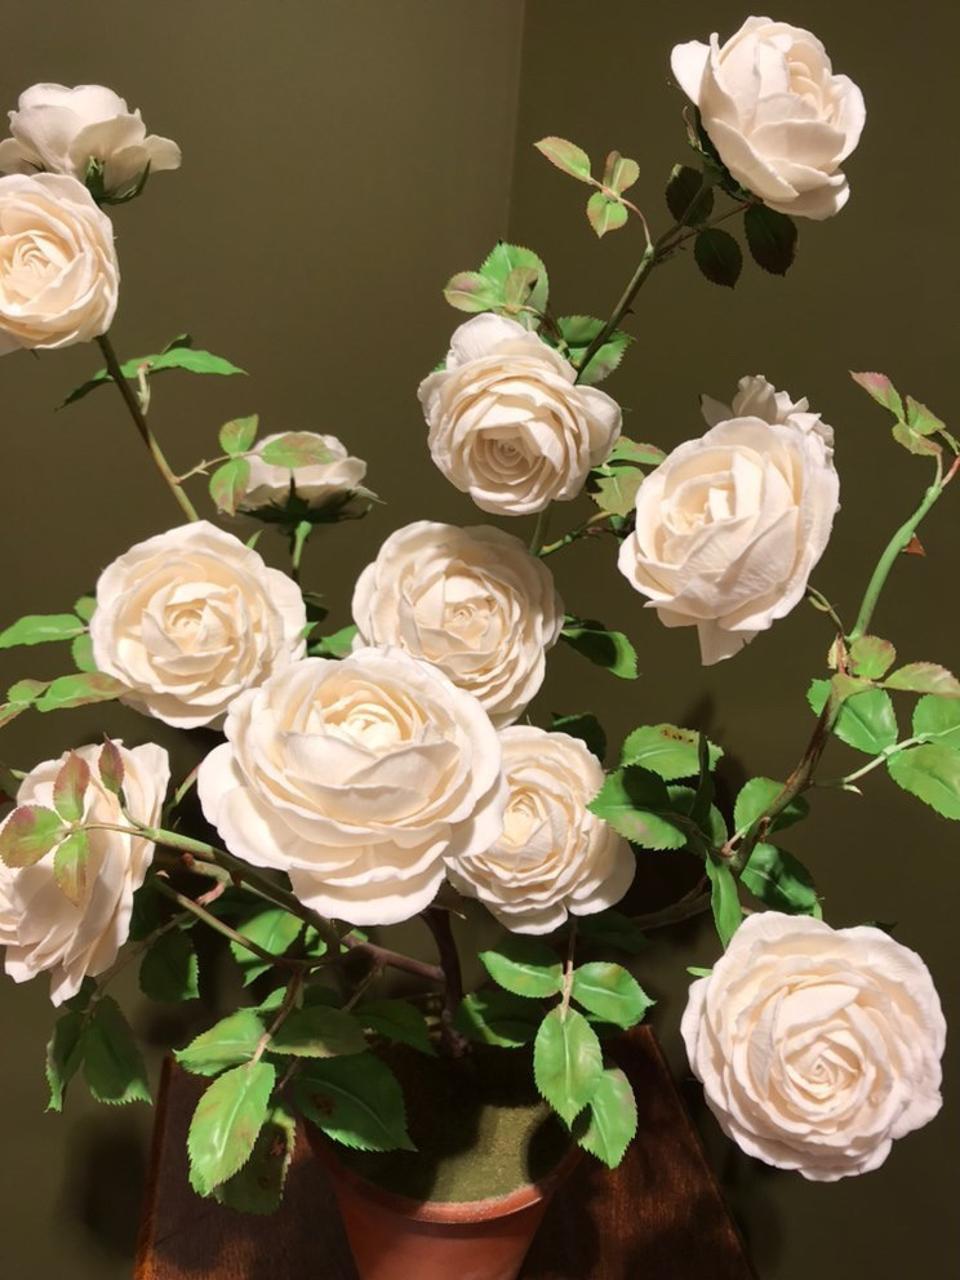 Porcelain flowers for Valentine's